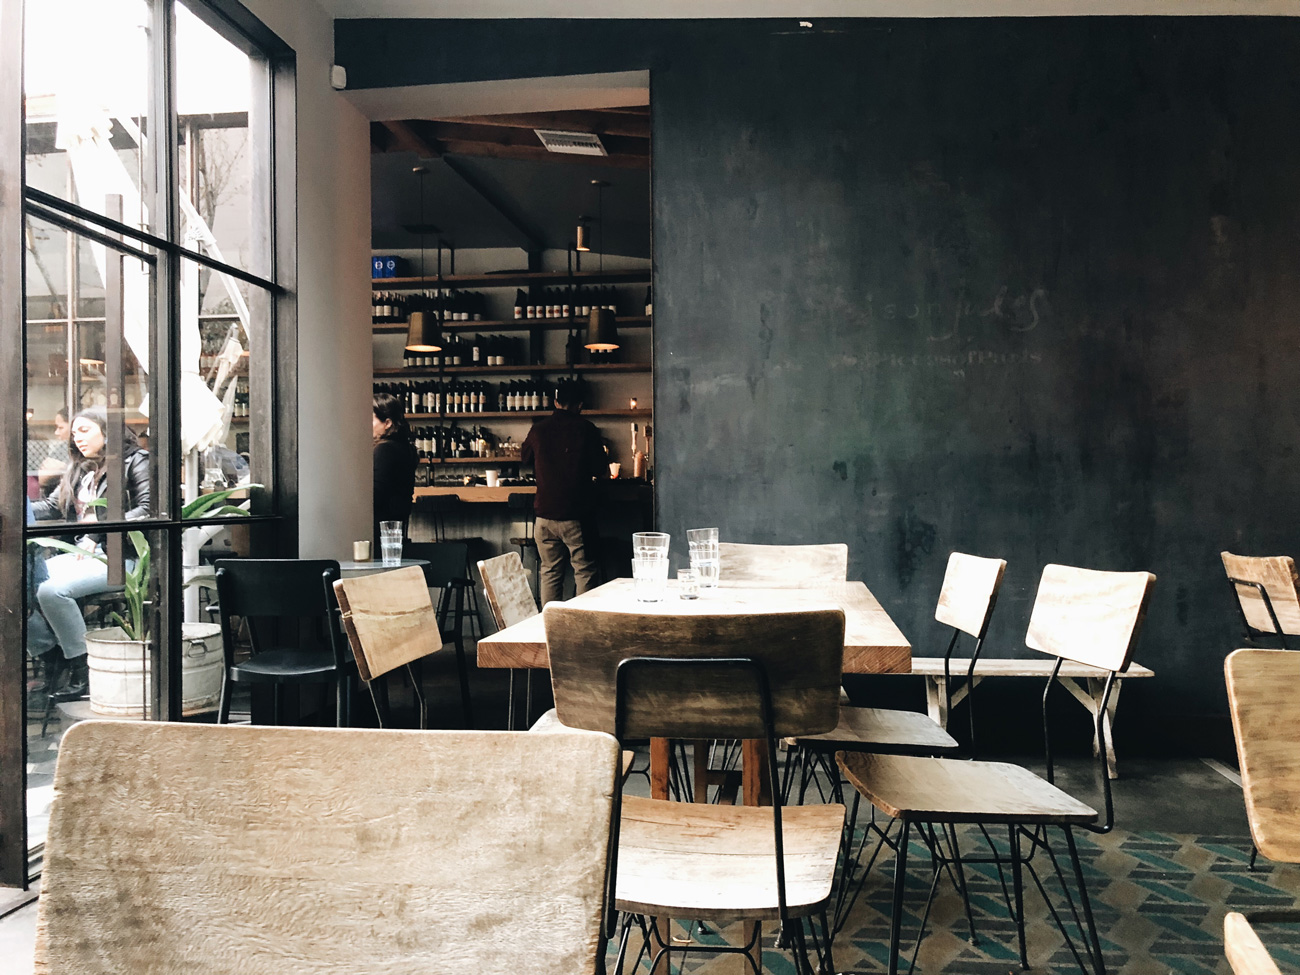 Los-Angeles-Essens-Guide-Tipps-Cafes-Resaturants-Frühstück-Mittagessen